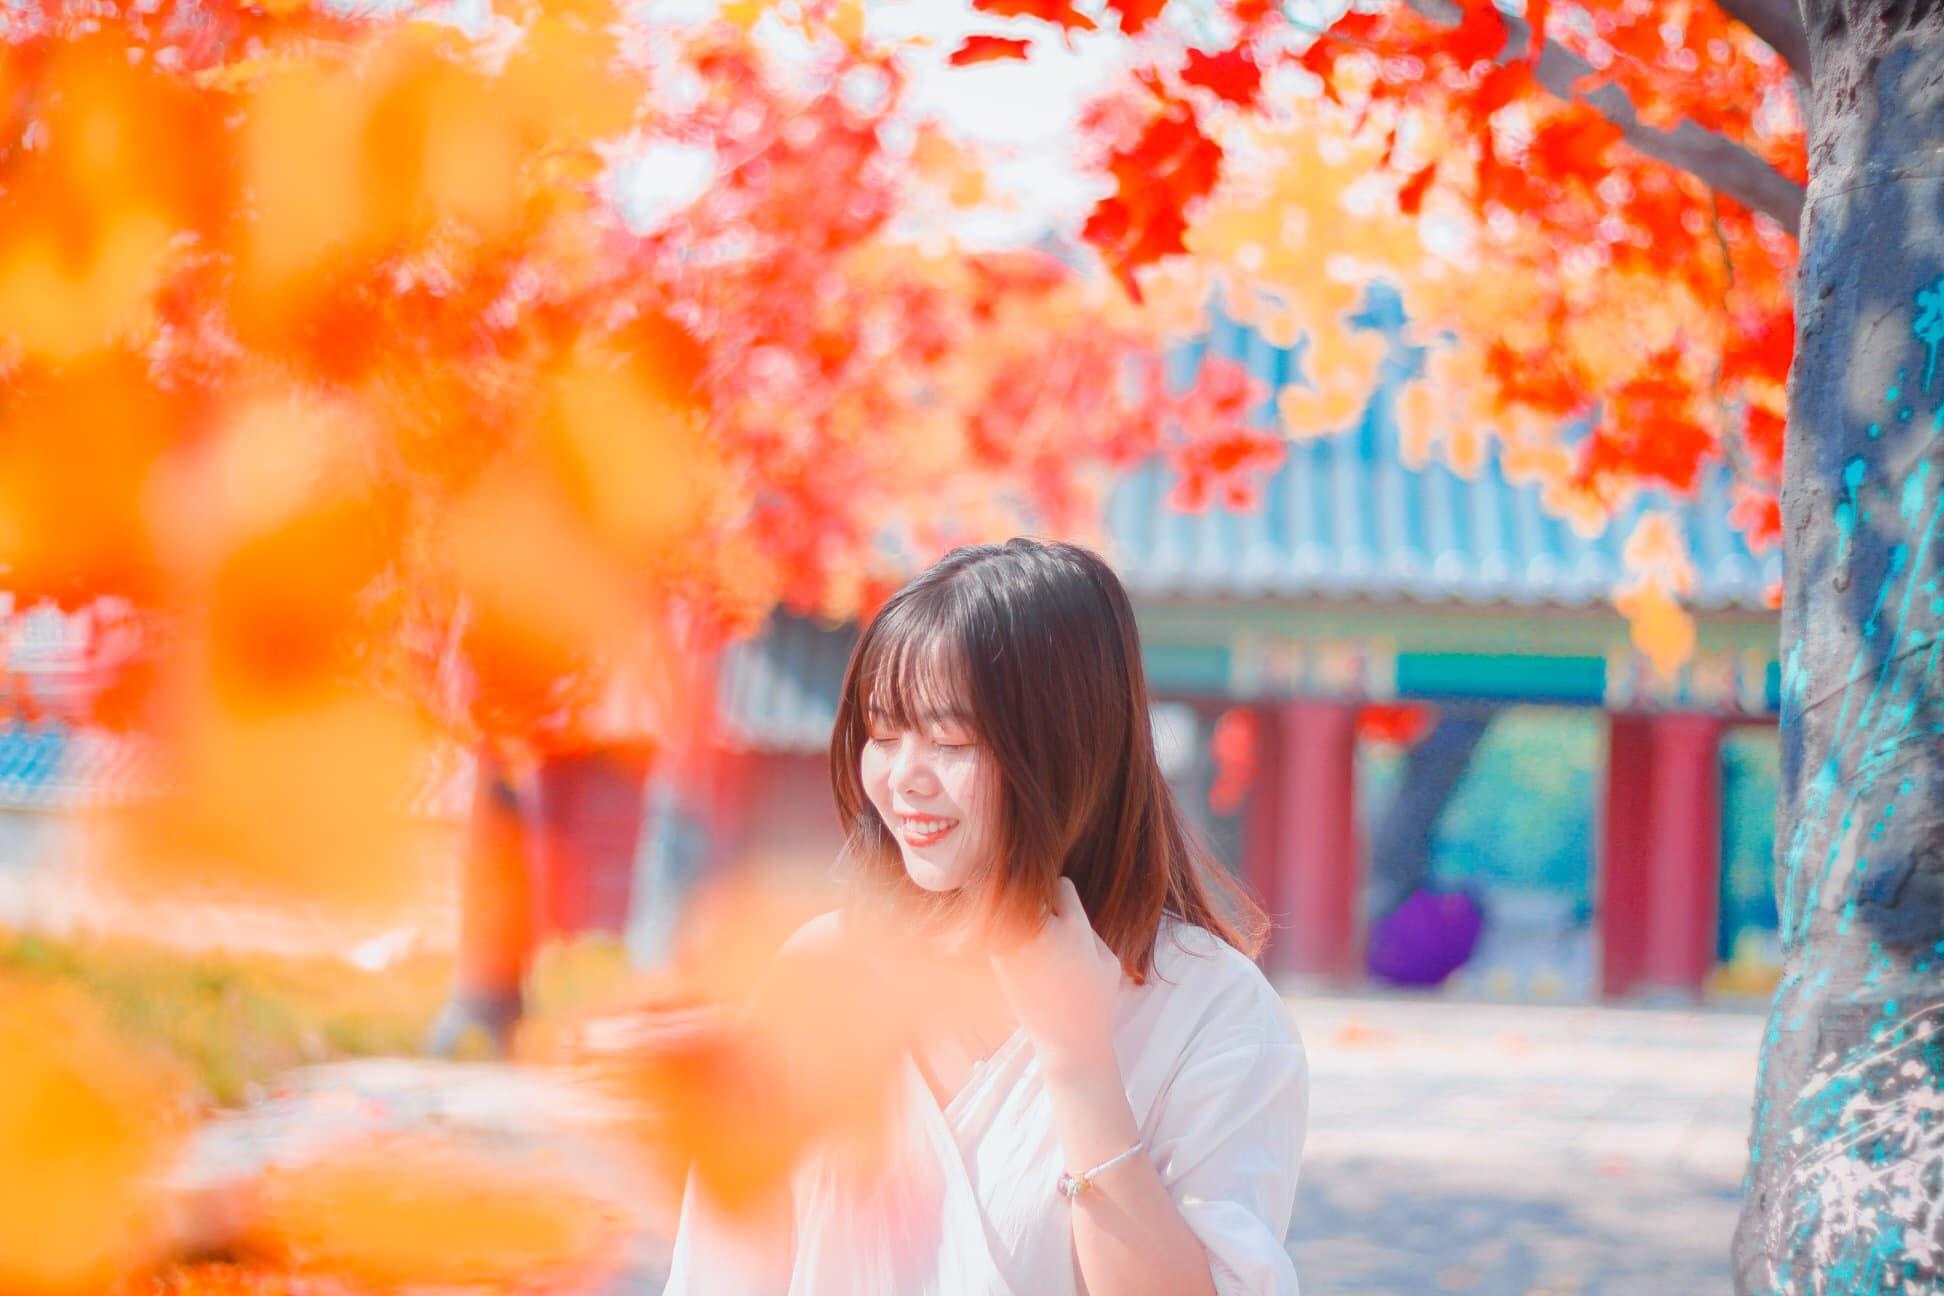 hanoi_diem-song-ao-o-ha-noi-1